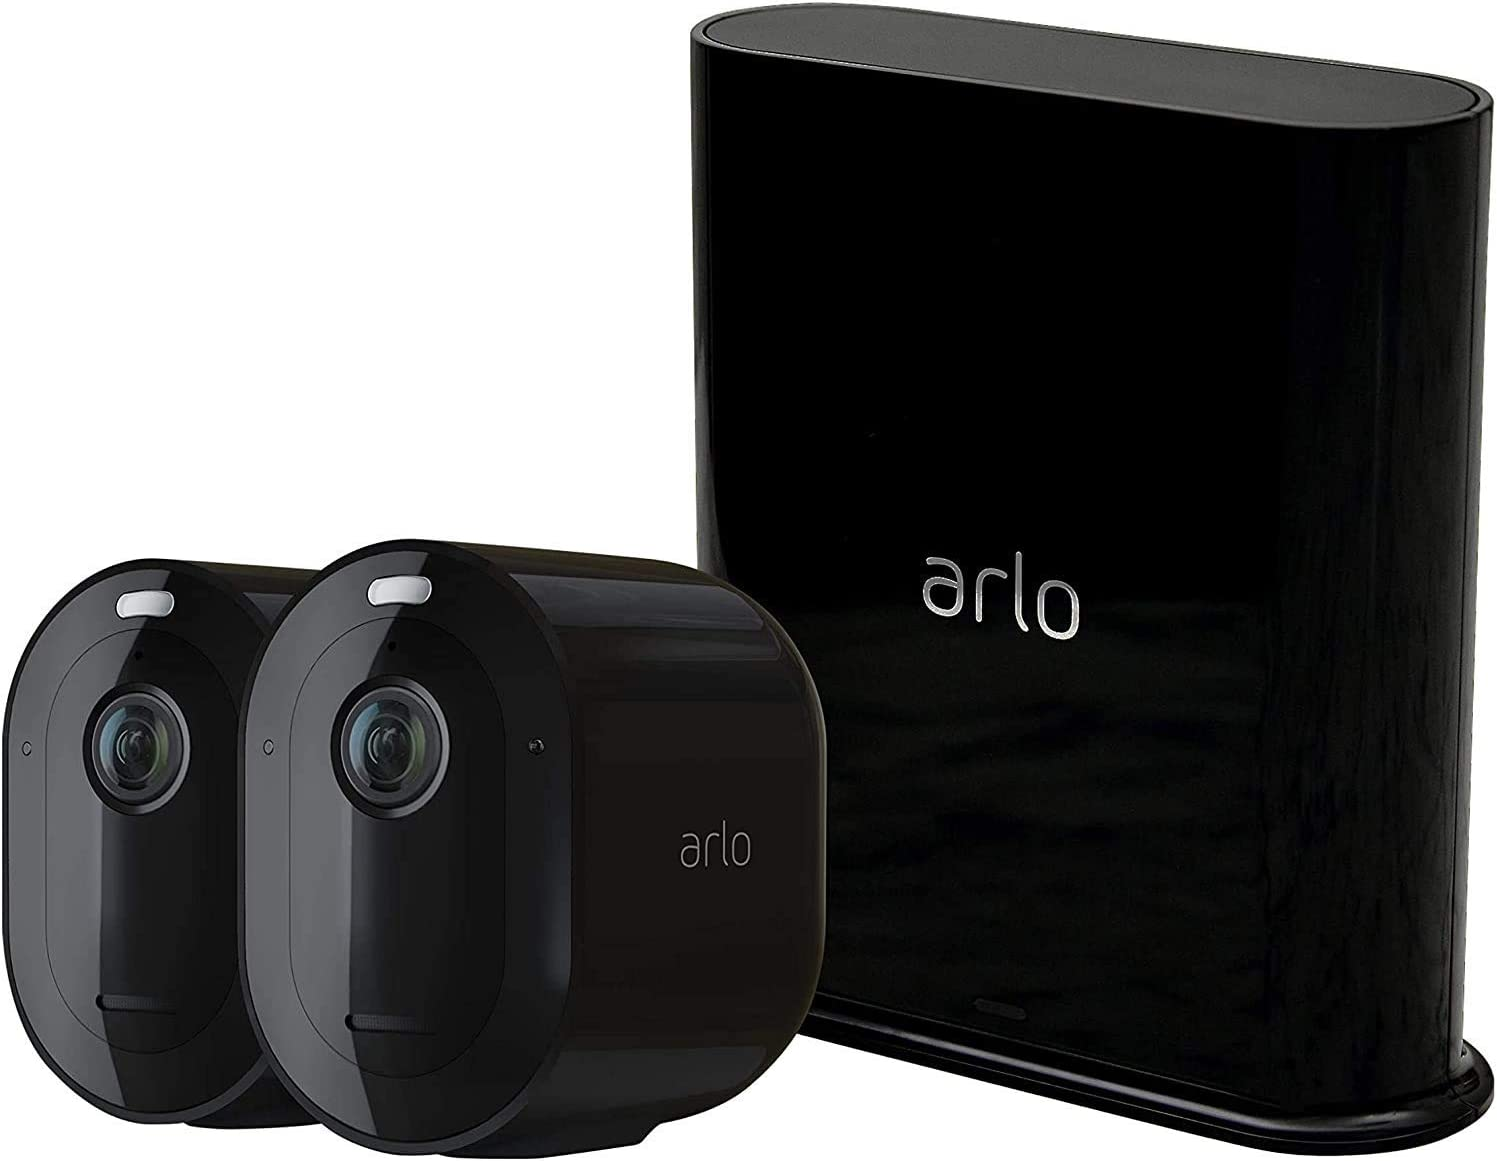 Arlo Pro 3 caméra de surveillance Wifi, Batterie rechargeable Alarme Grand angle...